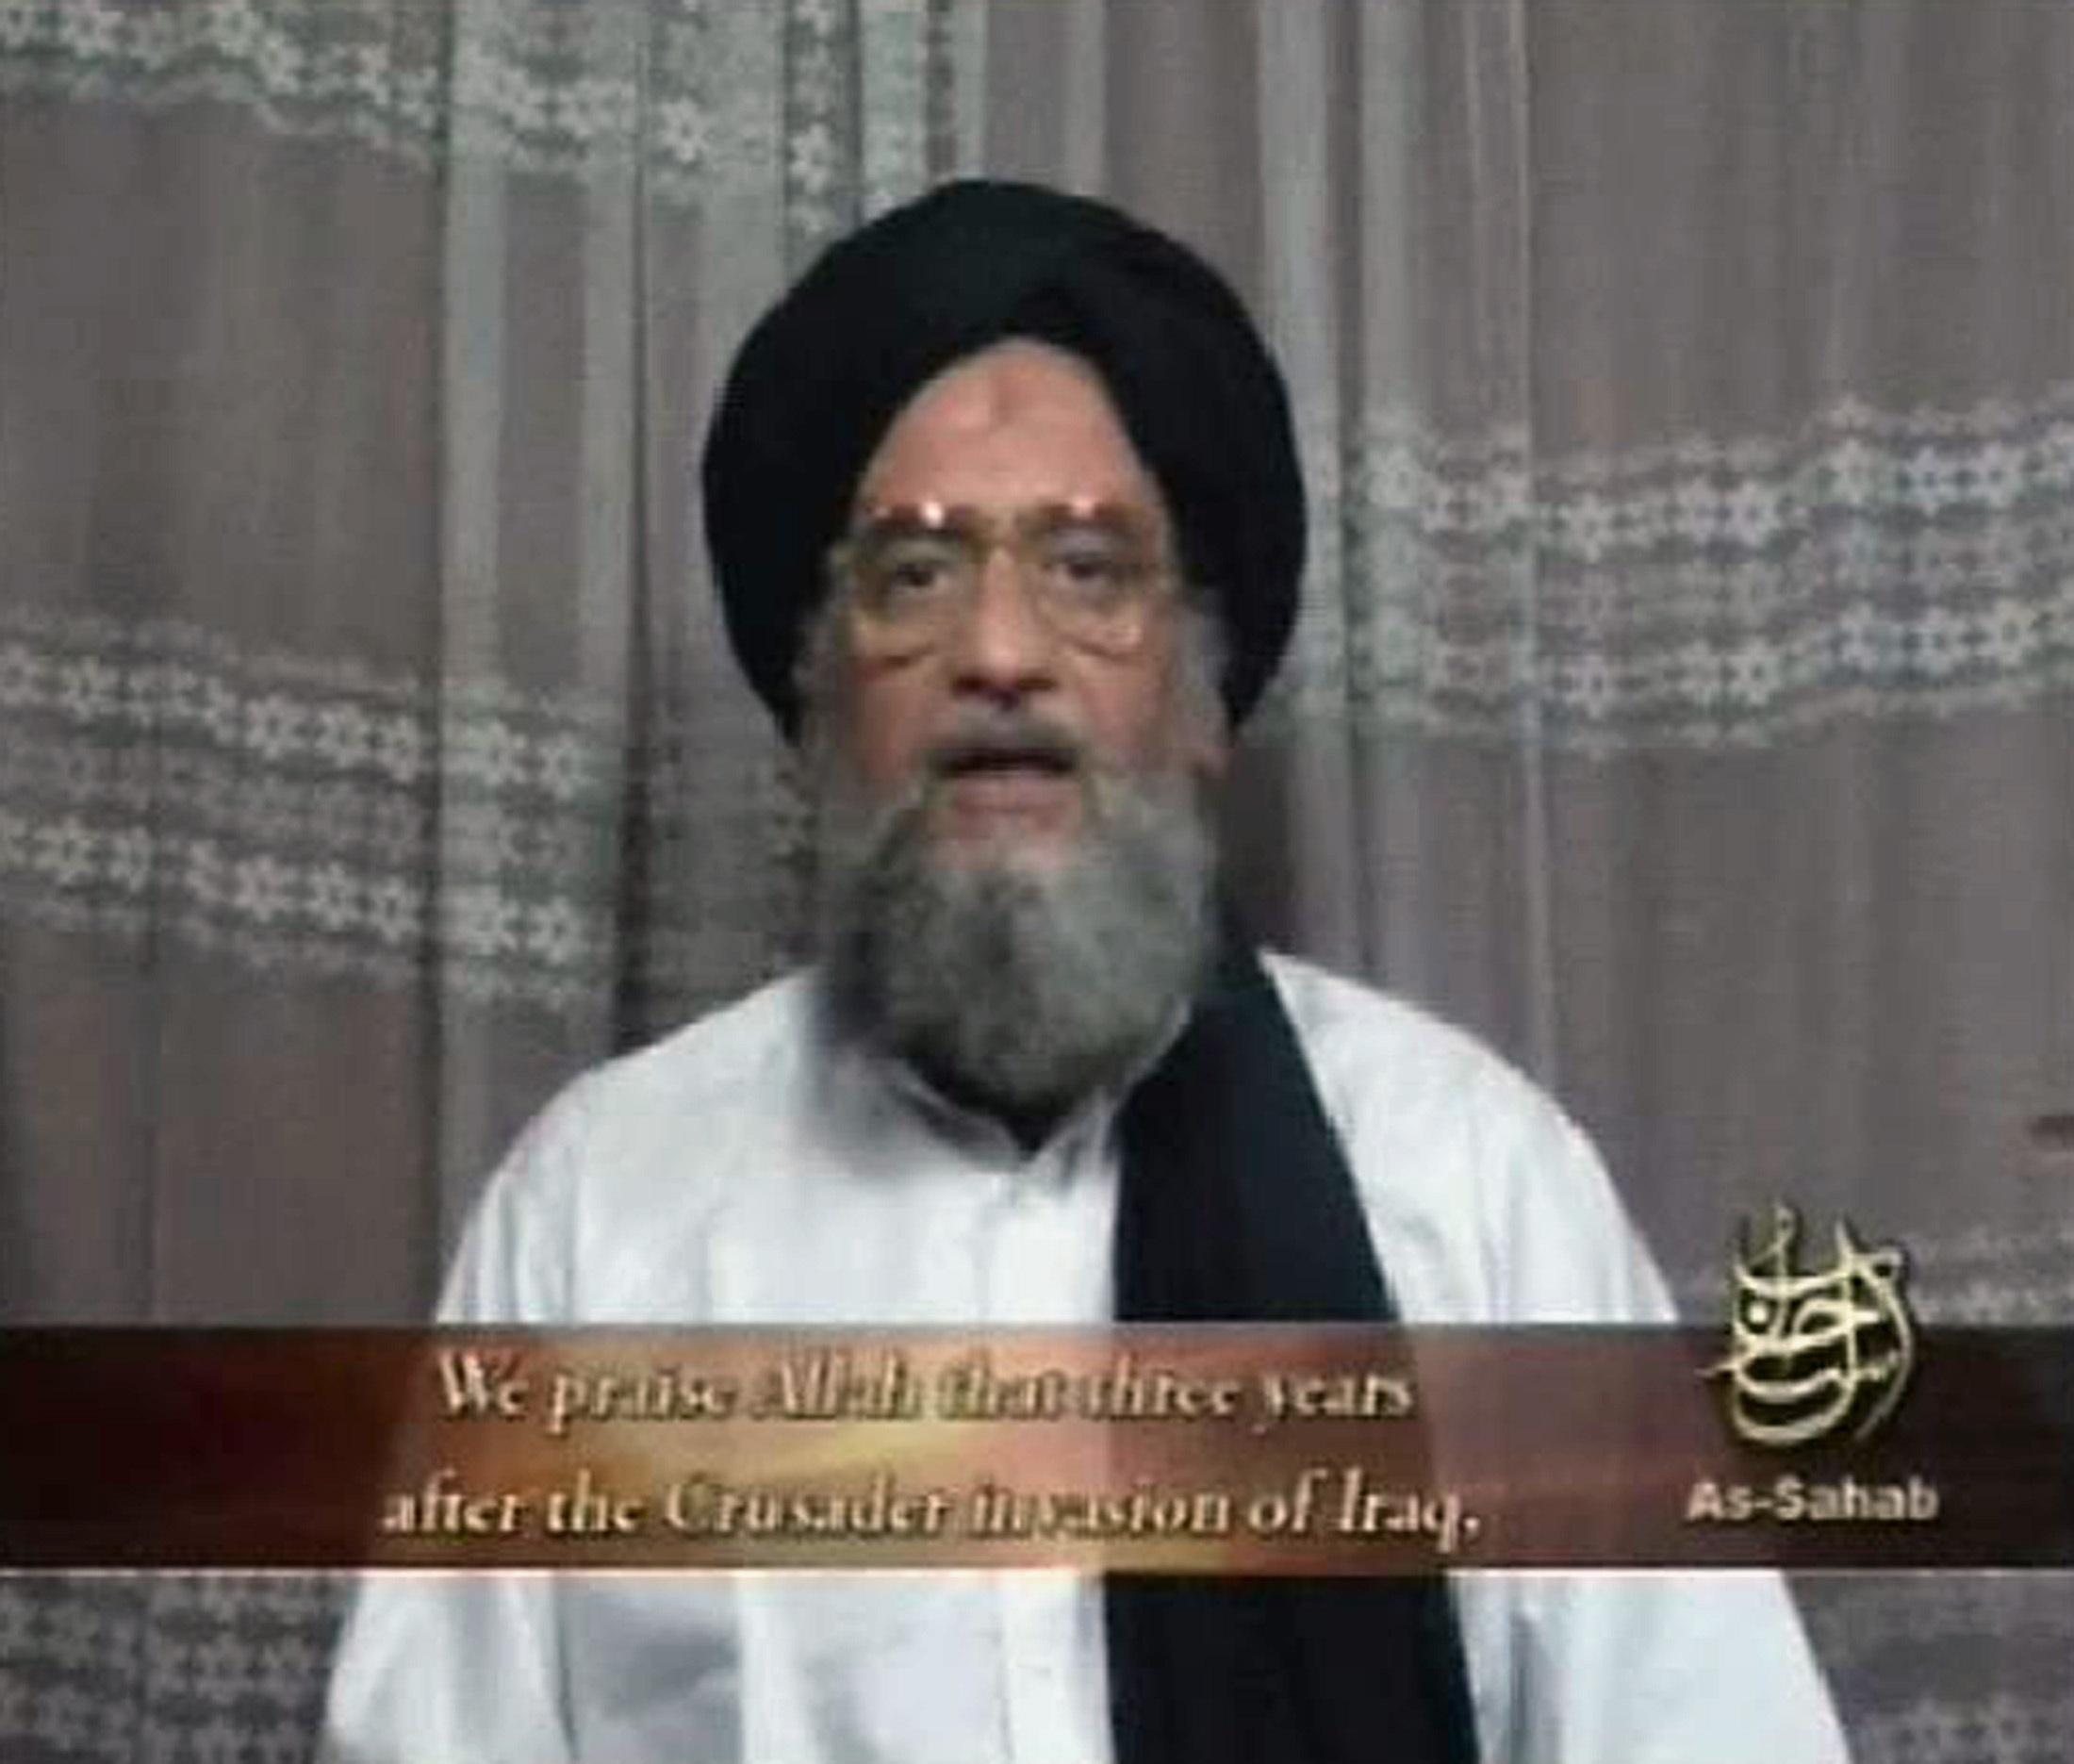 https www brookings edu blog order from chaos 2020 11 17 the death of ayman al zawahri and the future of al qaida